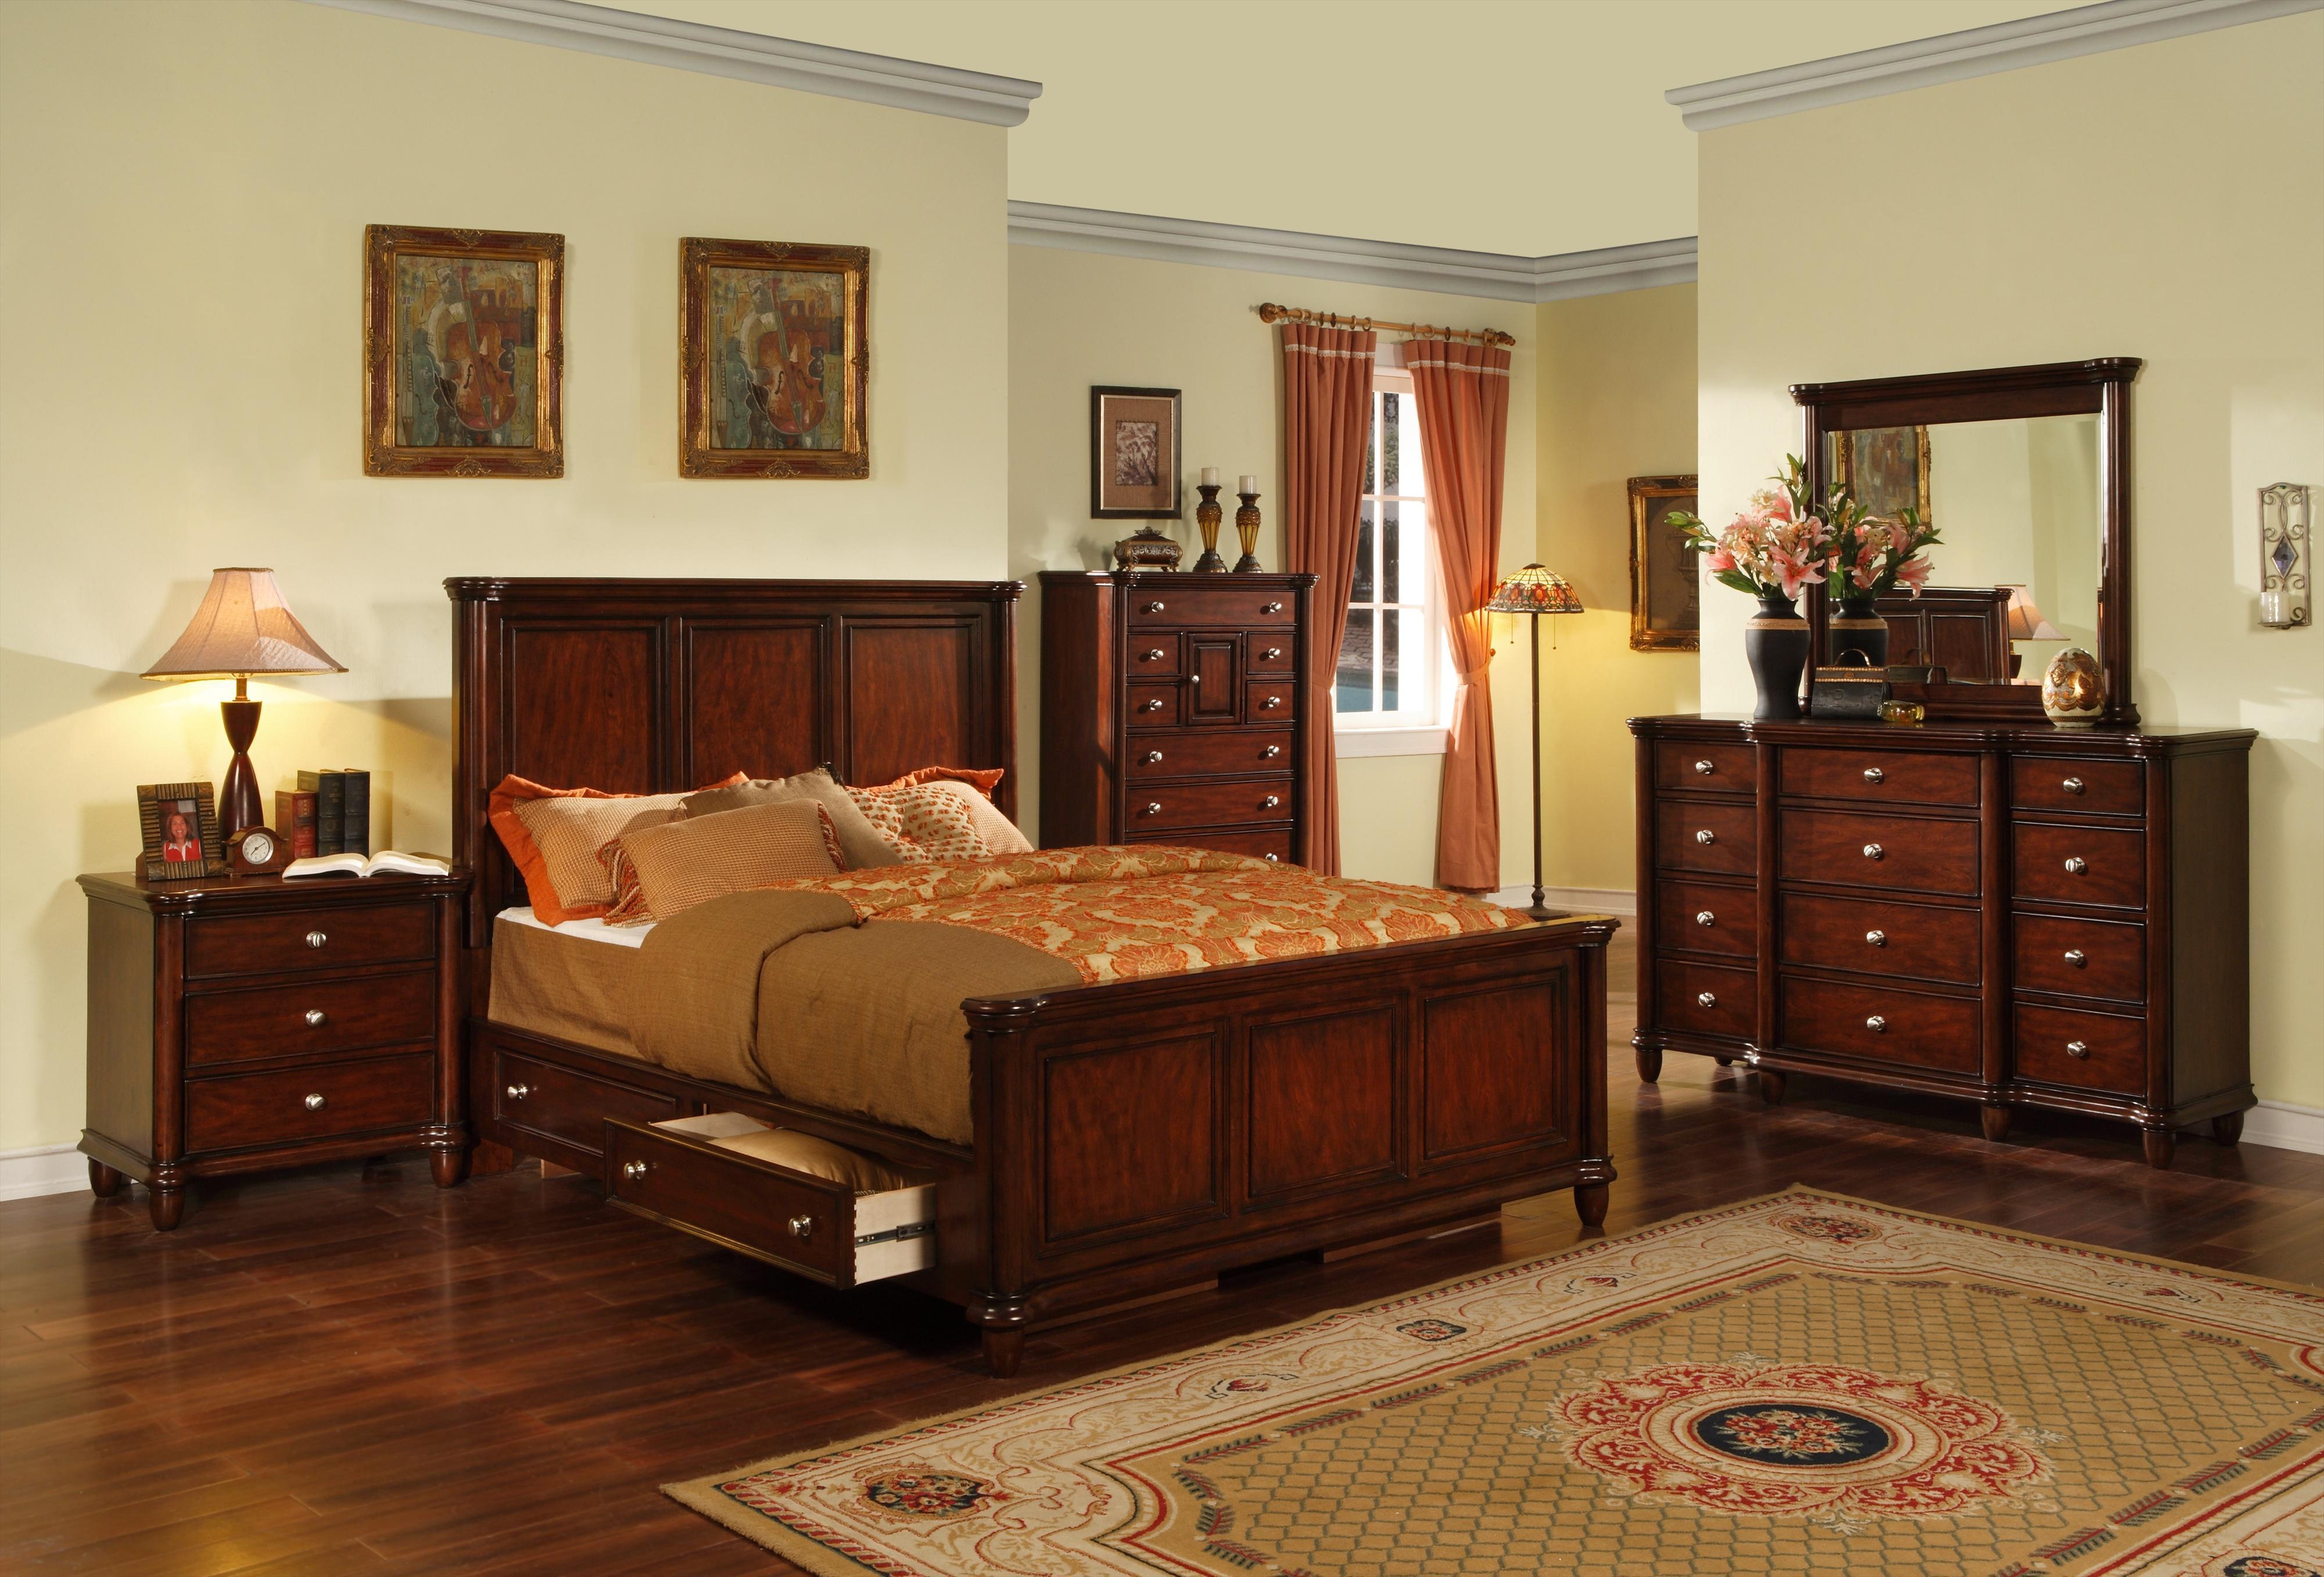 74+ King Bedroom Set With Storage Headboard Best